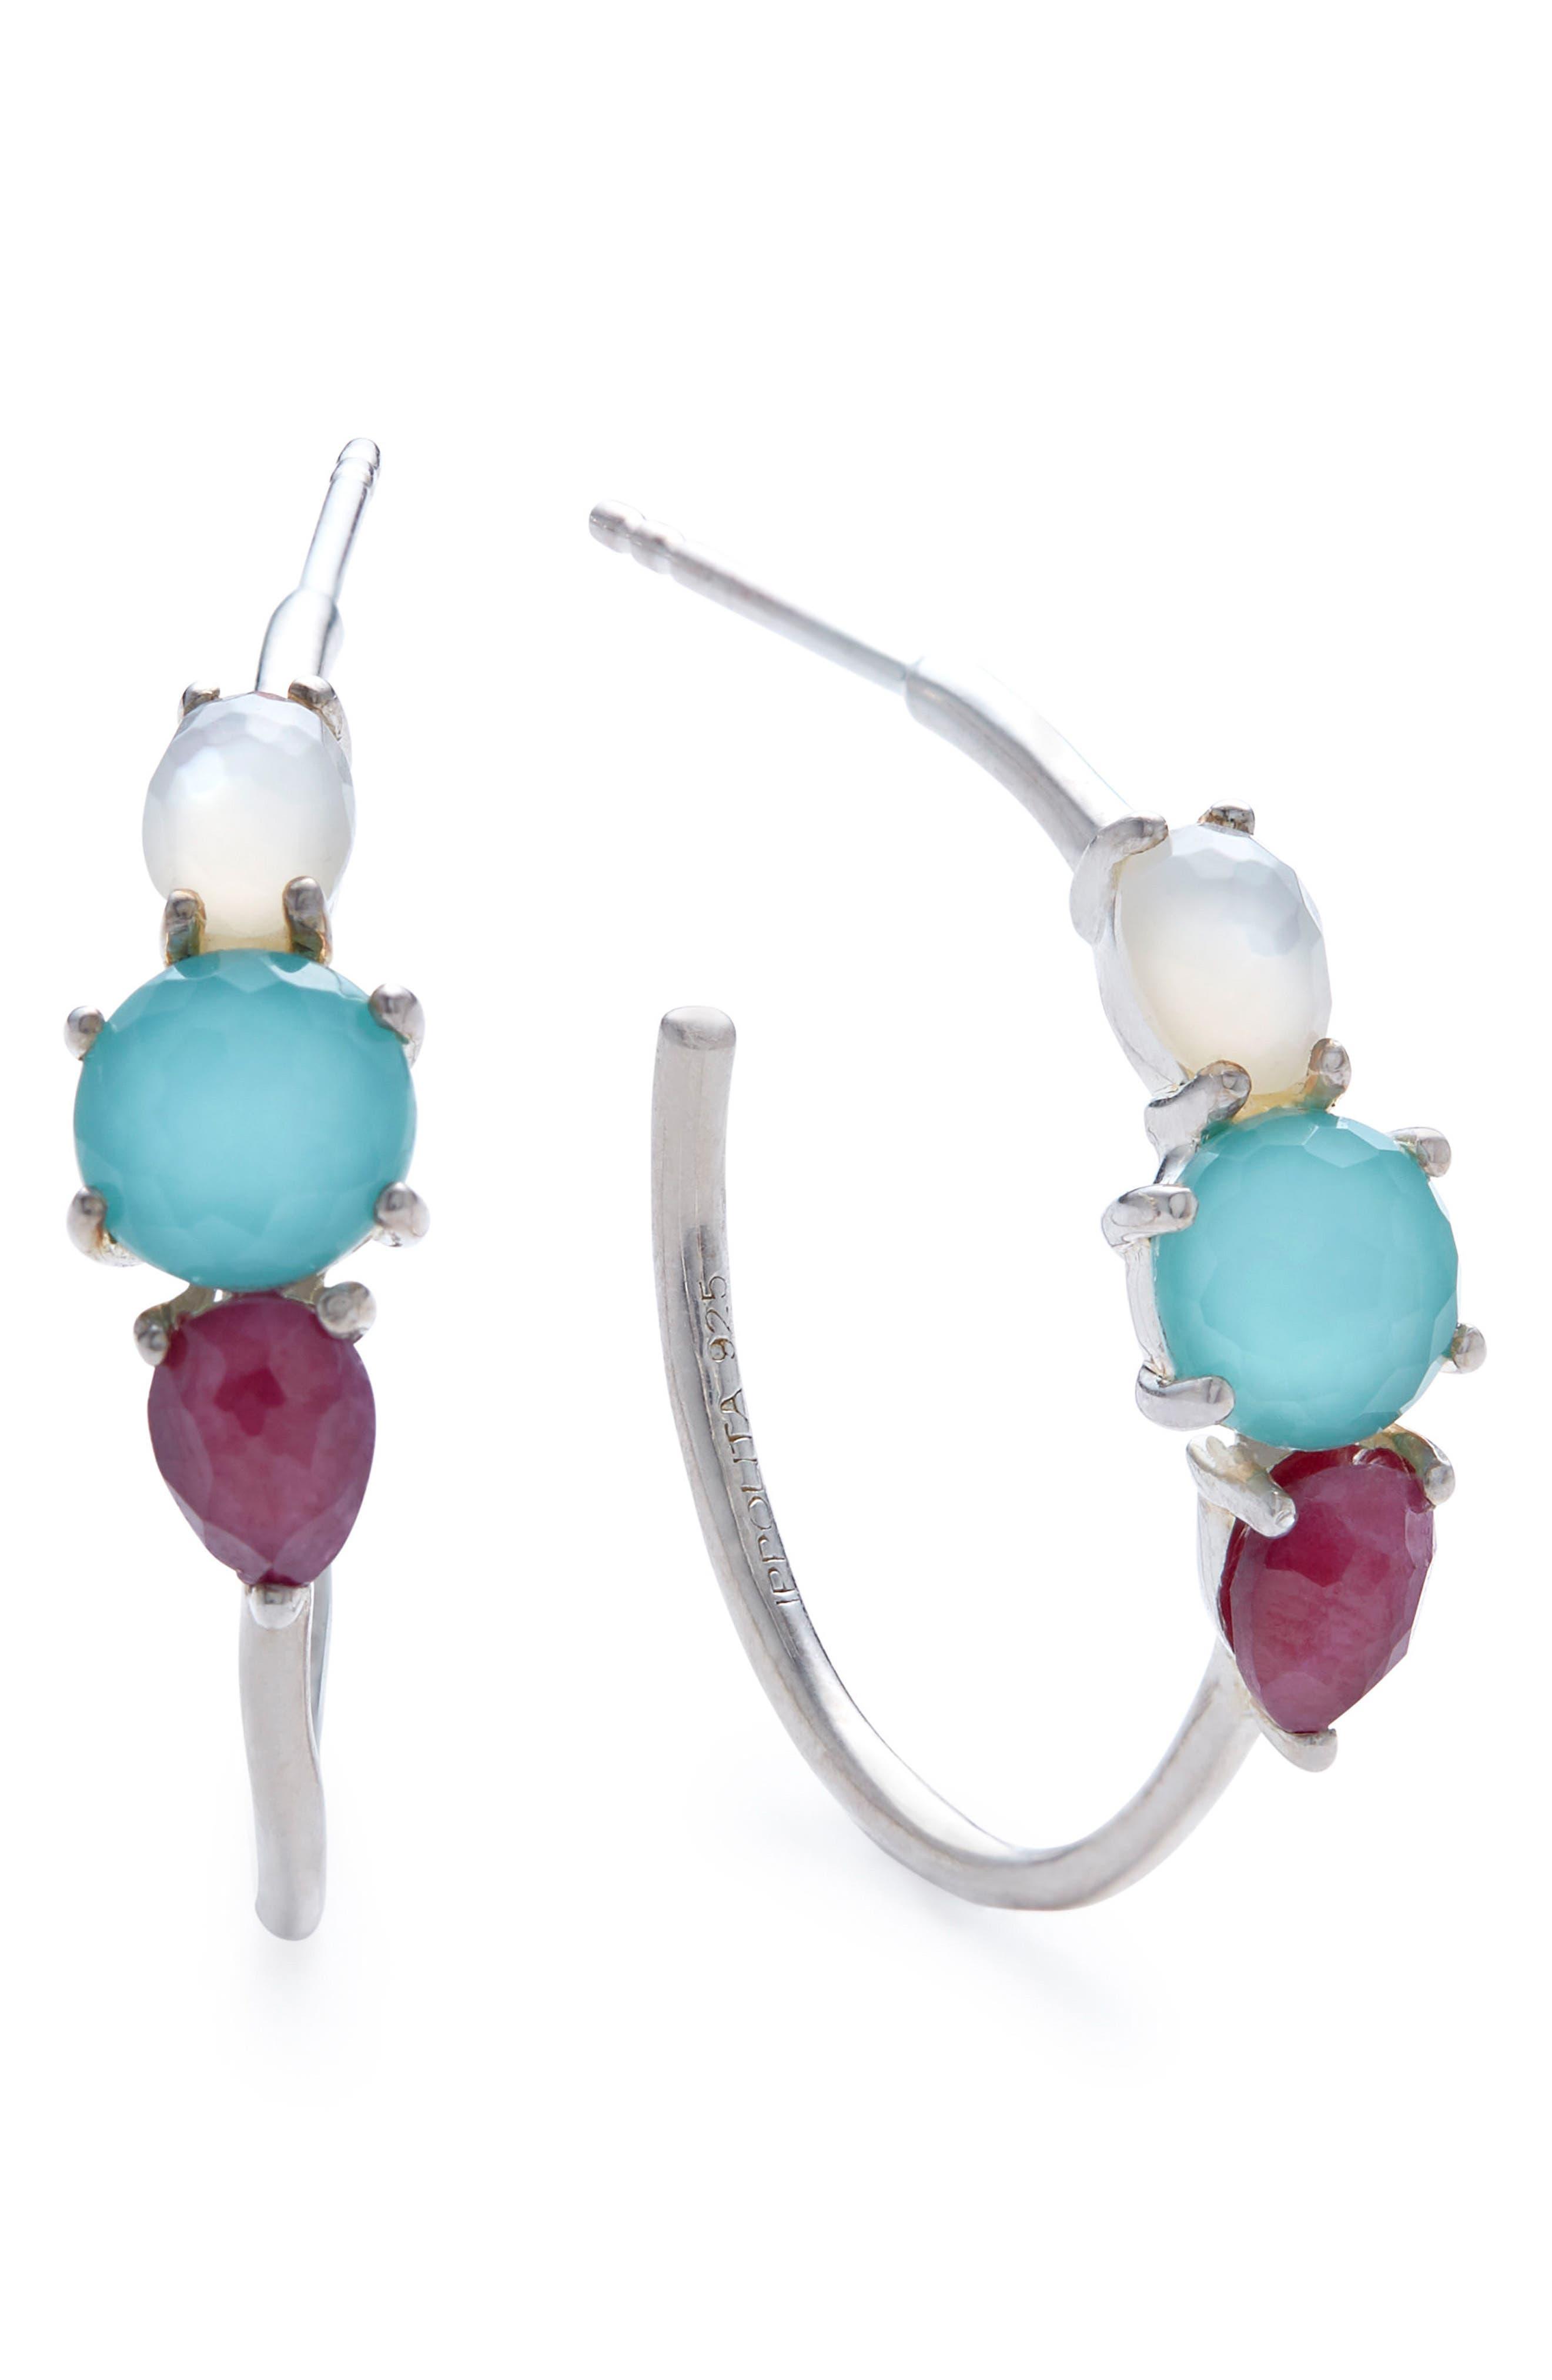 Ippolita Rock Candy Prong Set 3-Stone Hoop Earrings